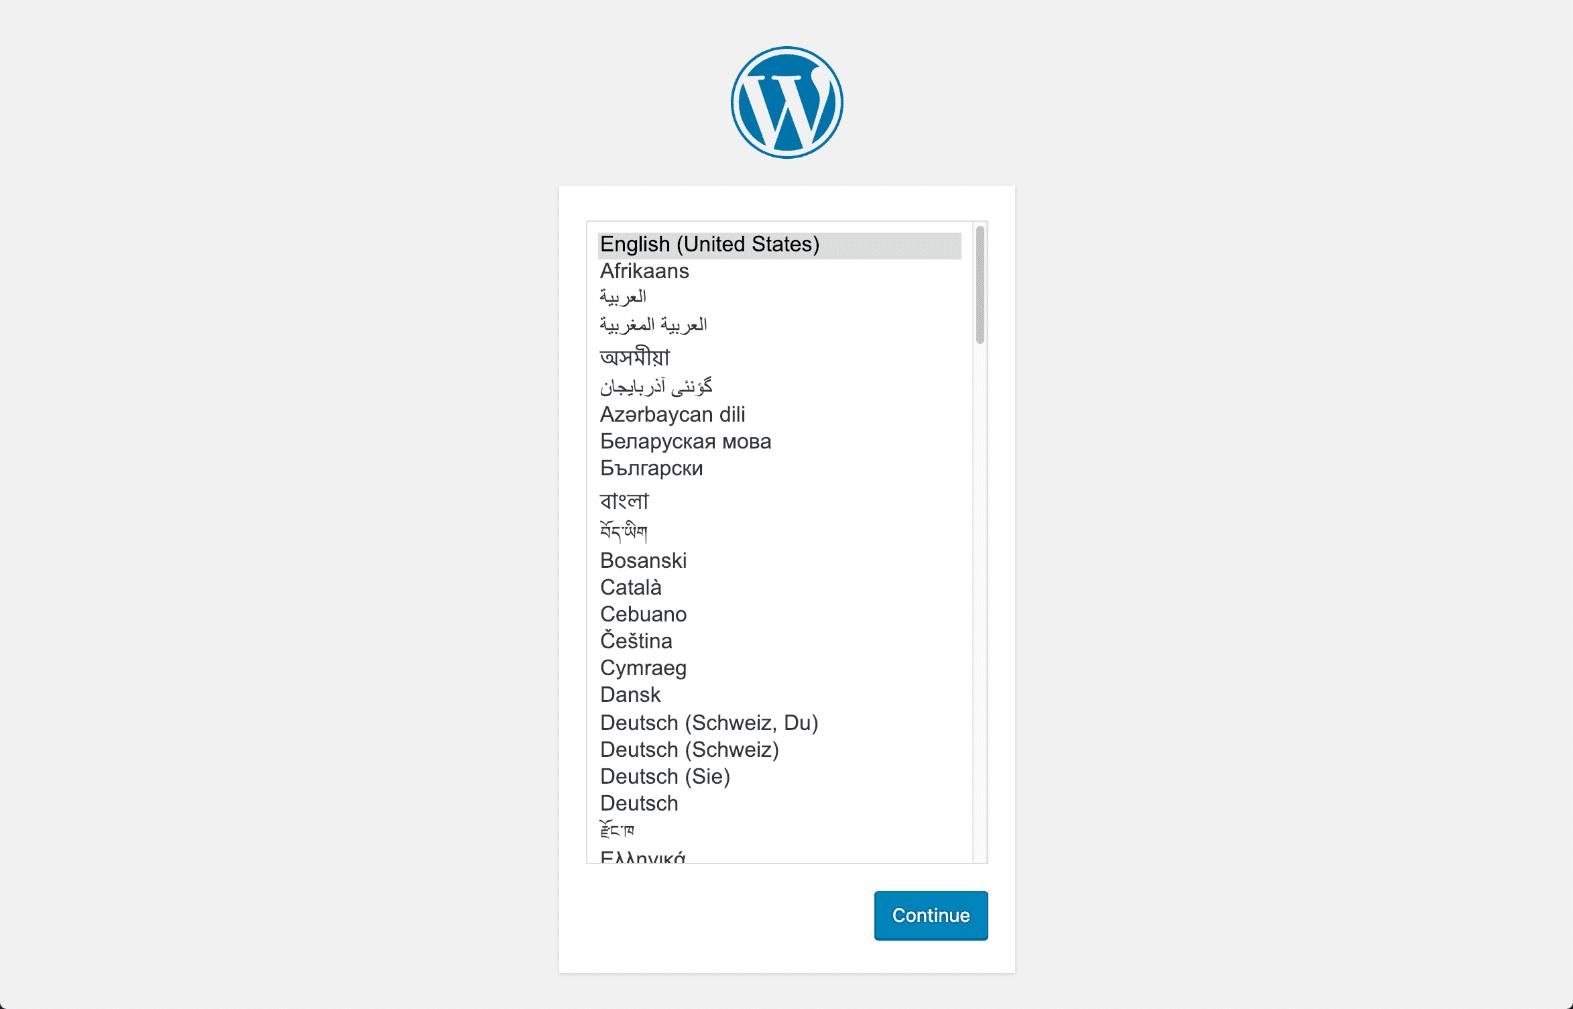 wordpress-install-language